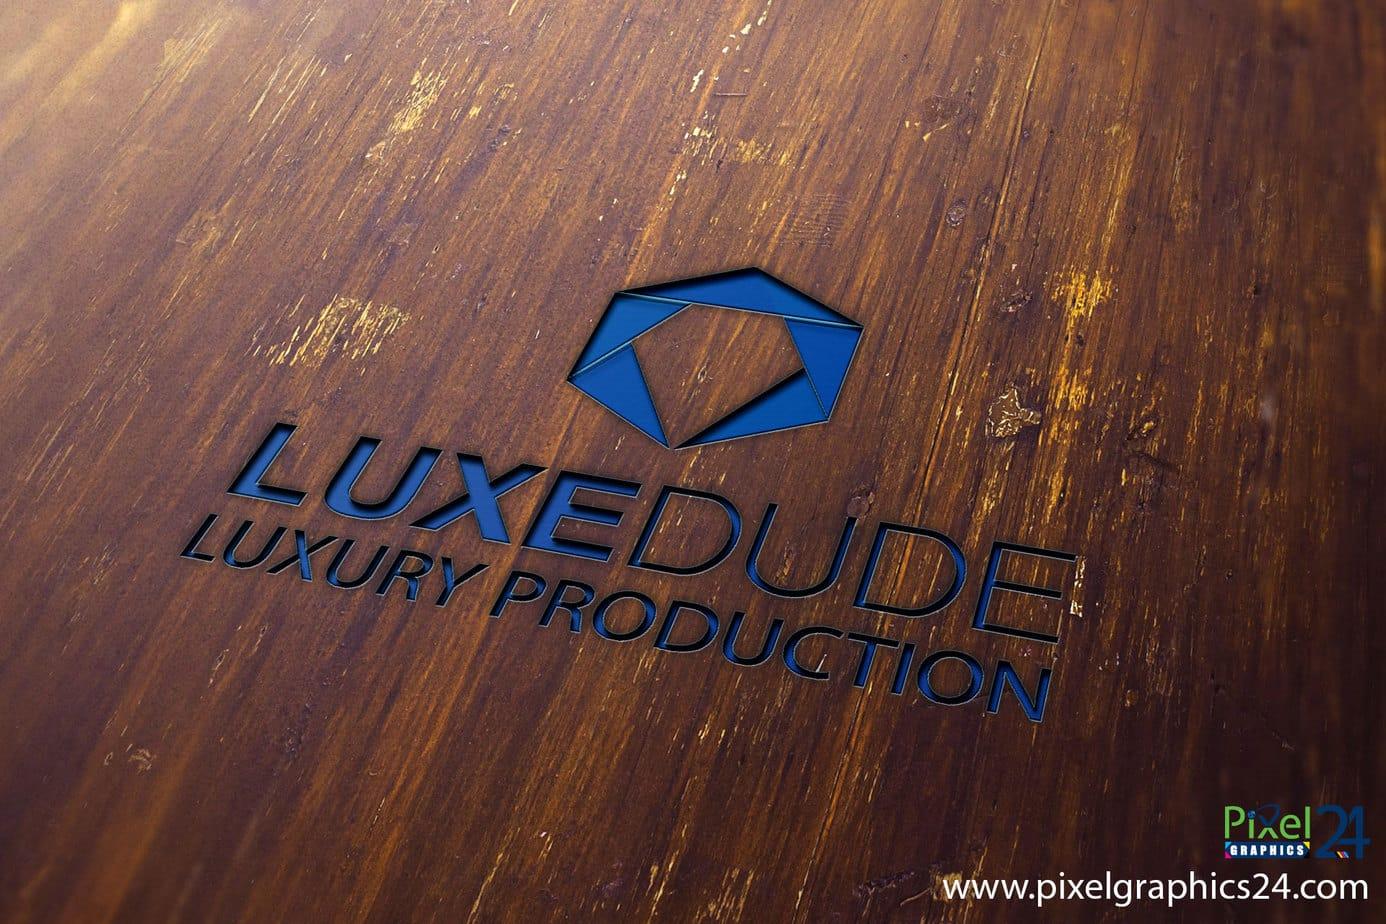 Logo design, logo design services, IT Solution, IT Solution Park, Creative logo design services